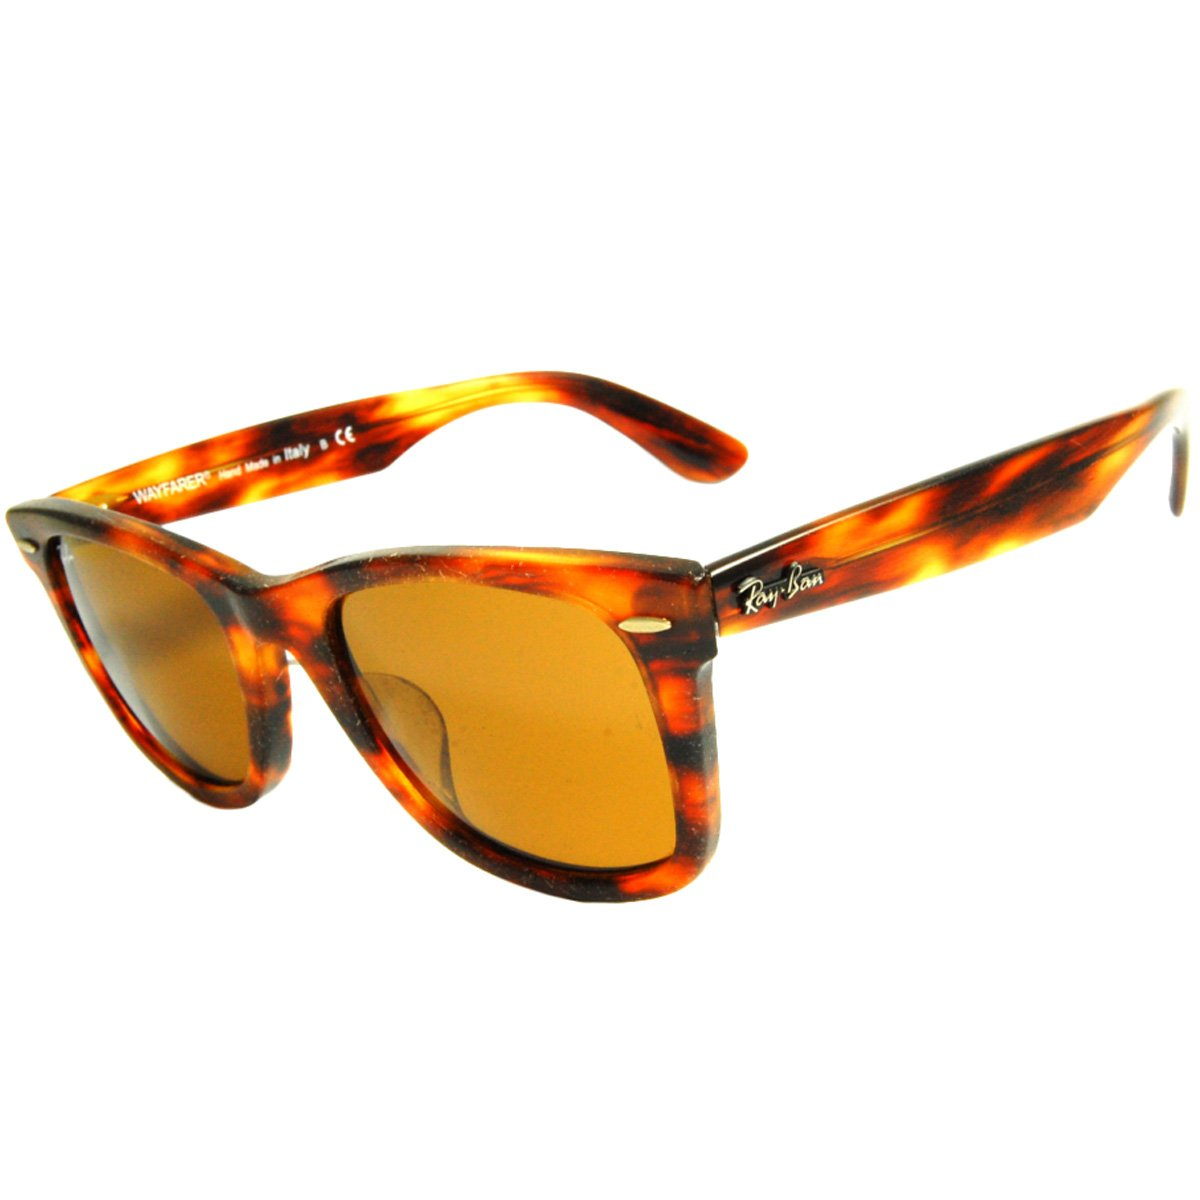 5a28343c52 Amazon.com: Ray-Ban Wayfarer RB2140-F - 1186 Sunglasses 52mm: Clothing